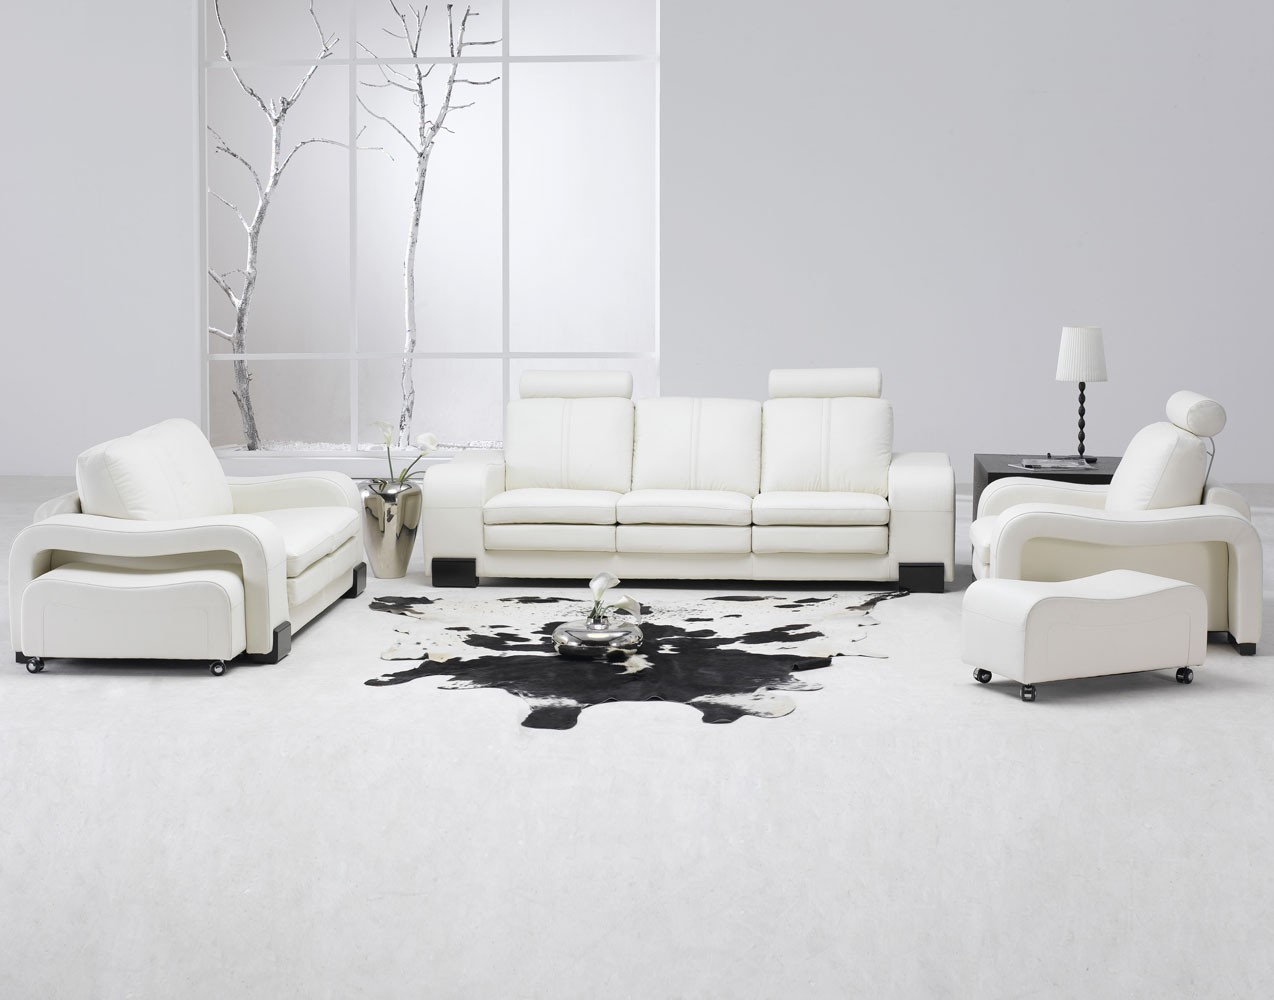 The Art Of Creating A Minimalist Interior Design